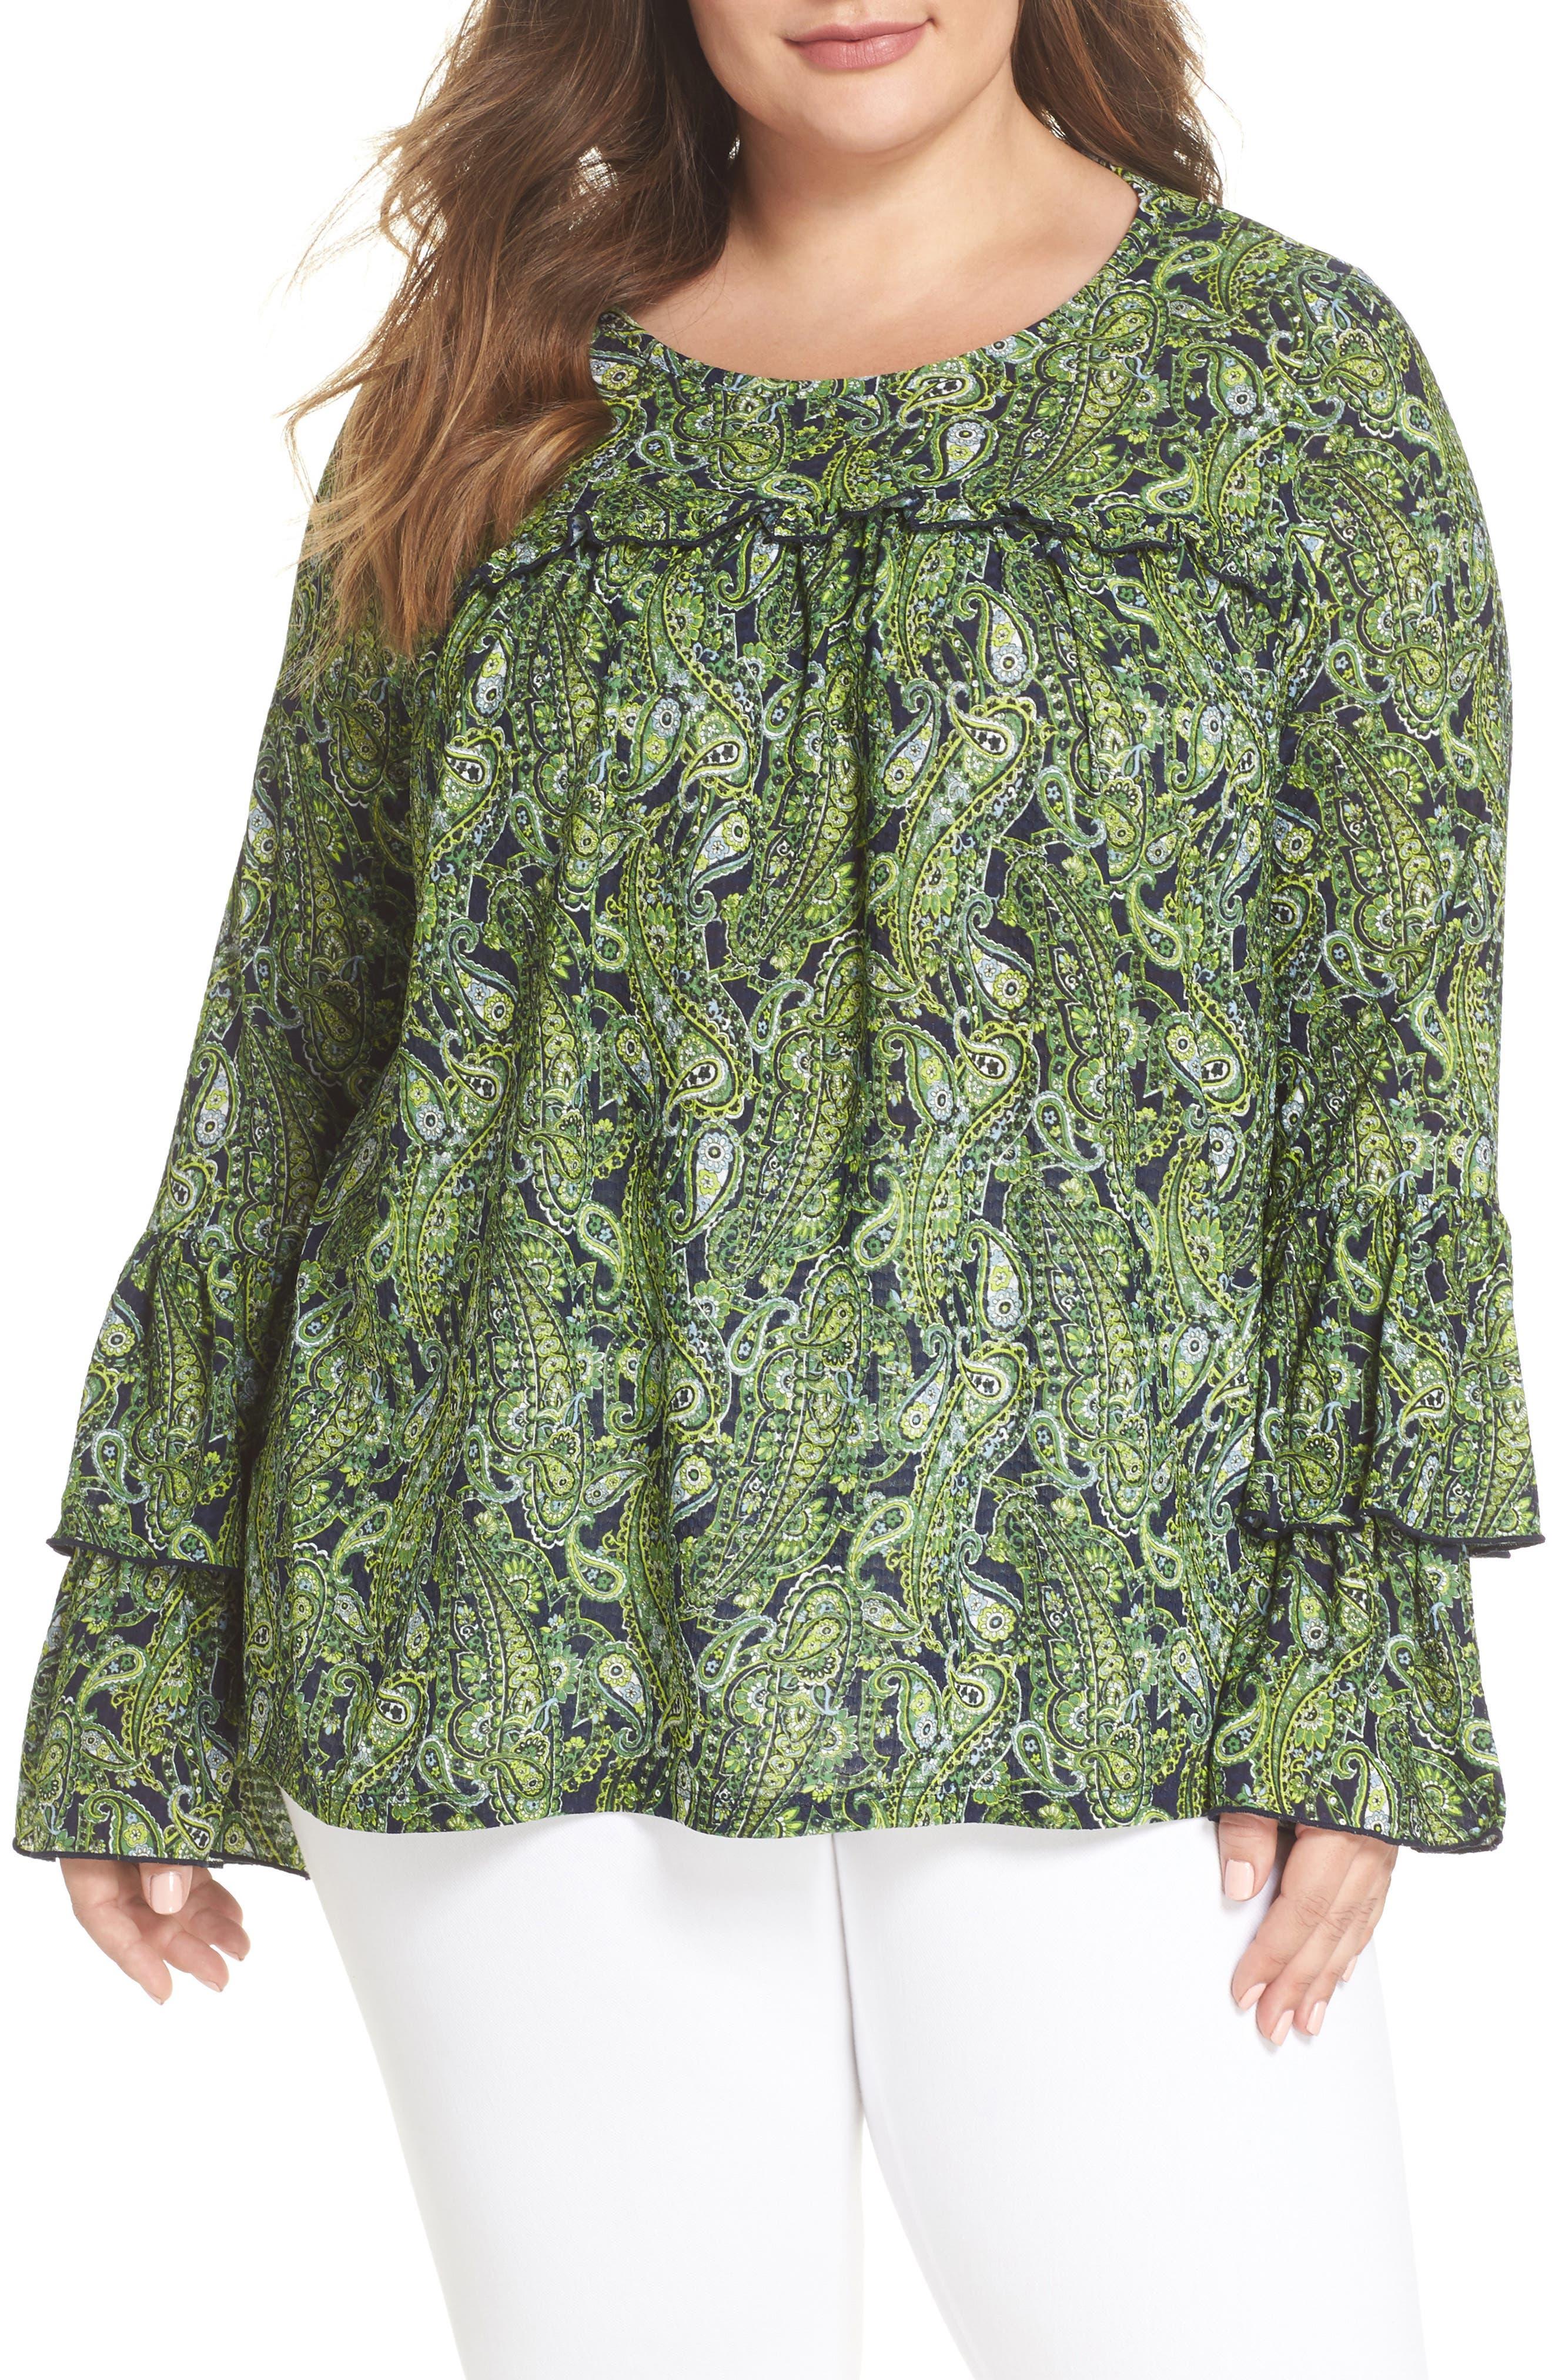 Pais Tier Sleeve Blouse,                             Main thumbnail 1, color,                             True Navy/ Green Apple Mu